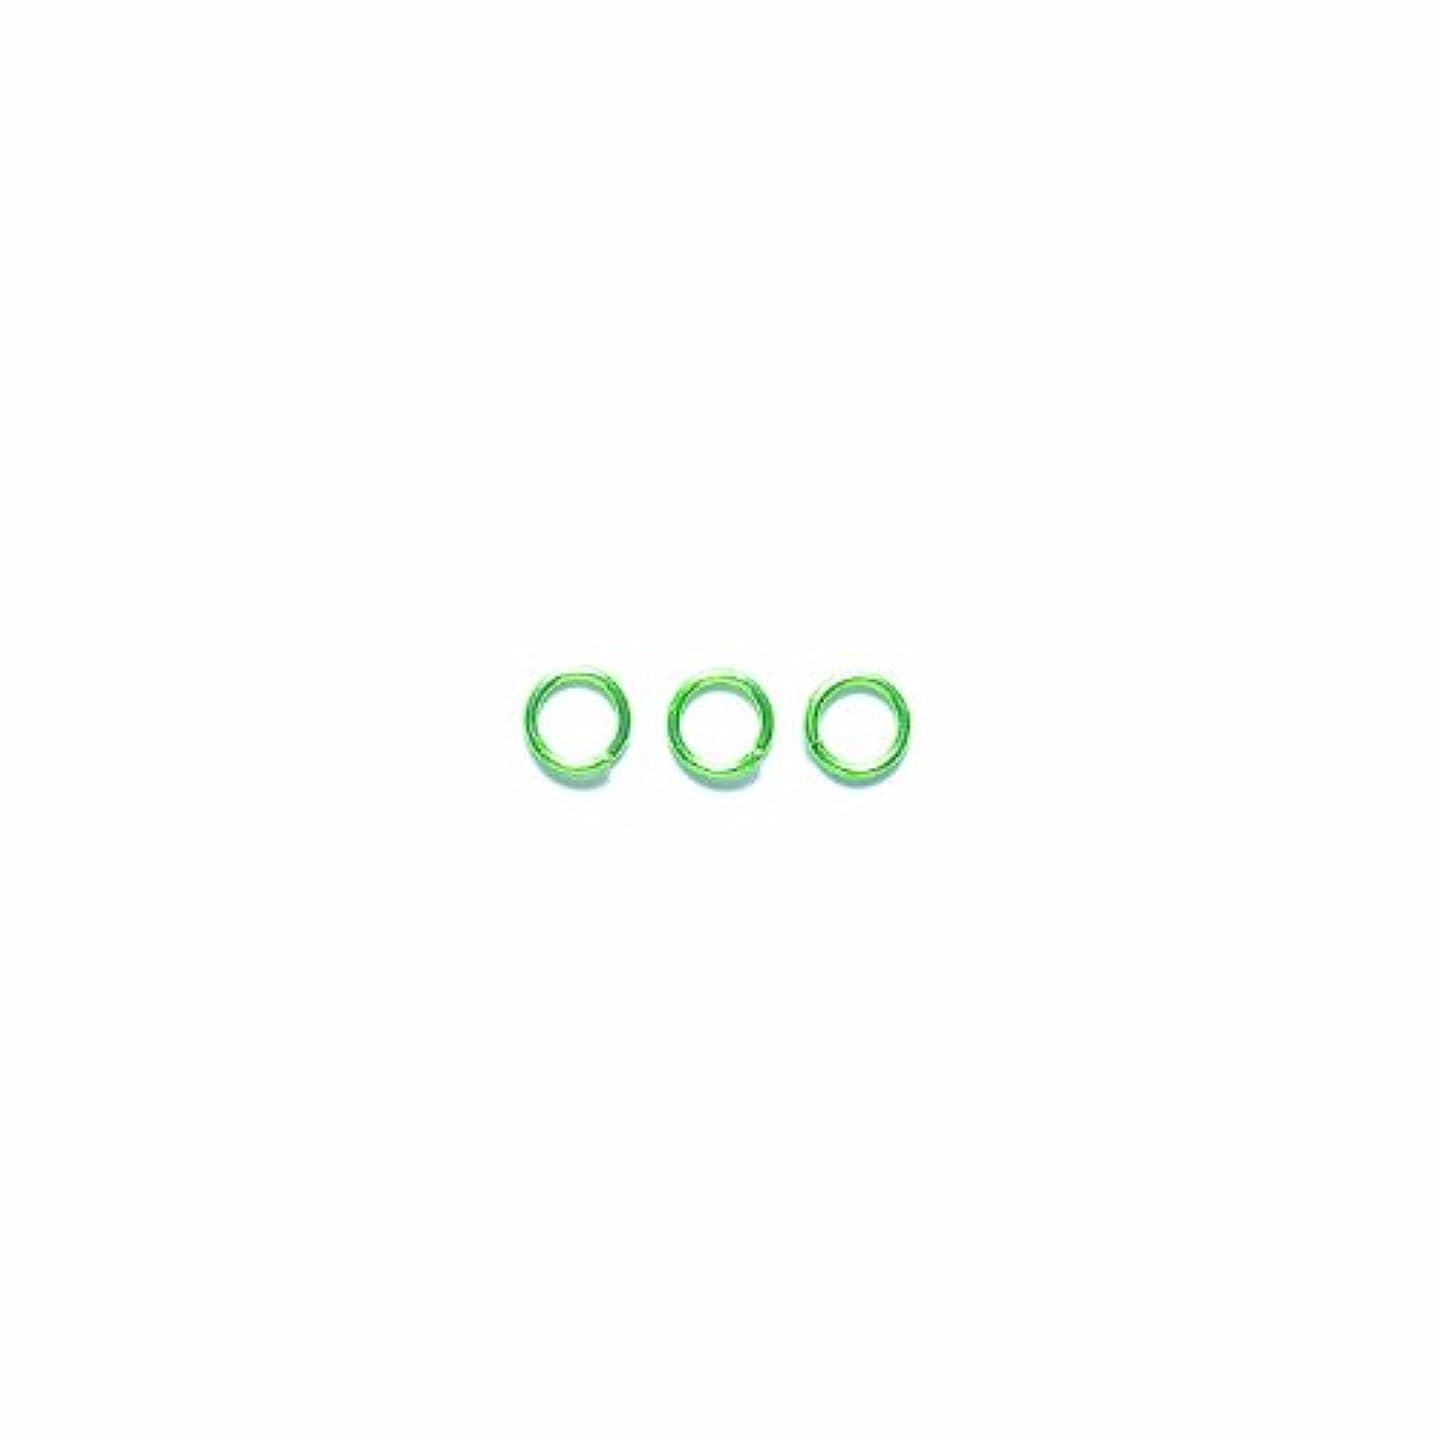 Shipwreck Beads Electroplated Brass Jump Ring, 5 mm, 19-Gauge, Metallic, Lime Green, 50 gm Pack